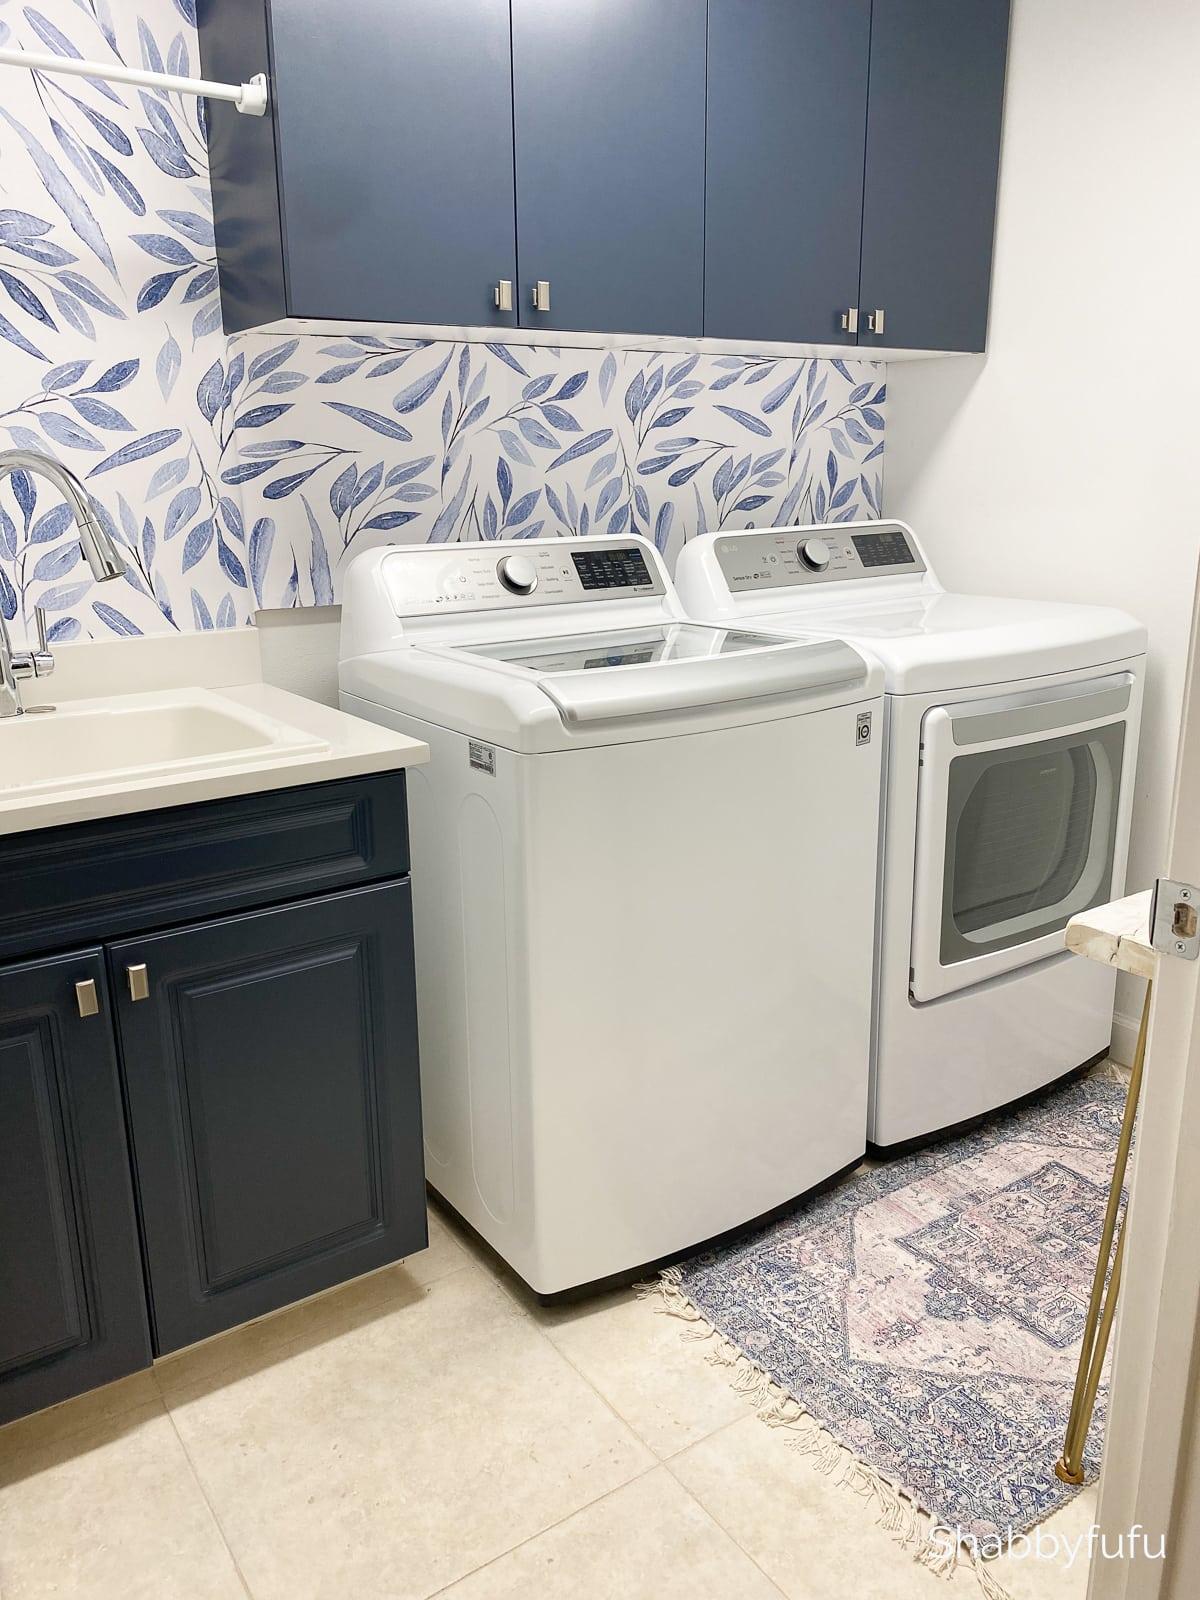 Benjamin Moore Hale Navy in a laundry room